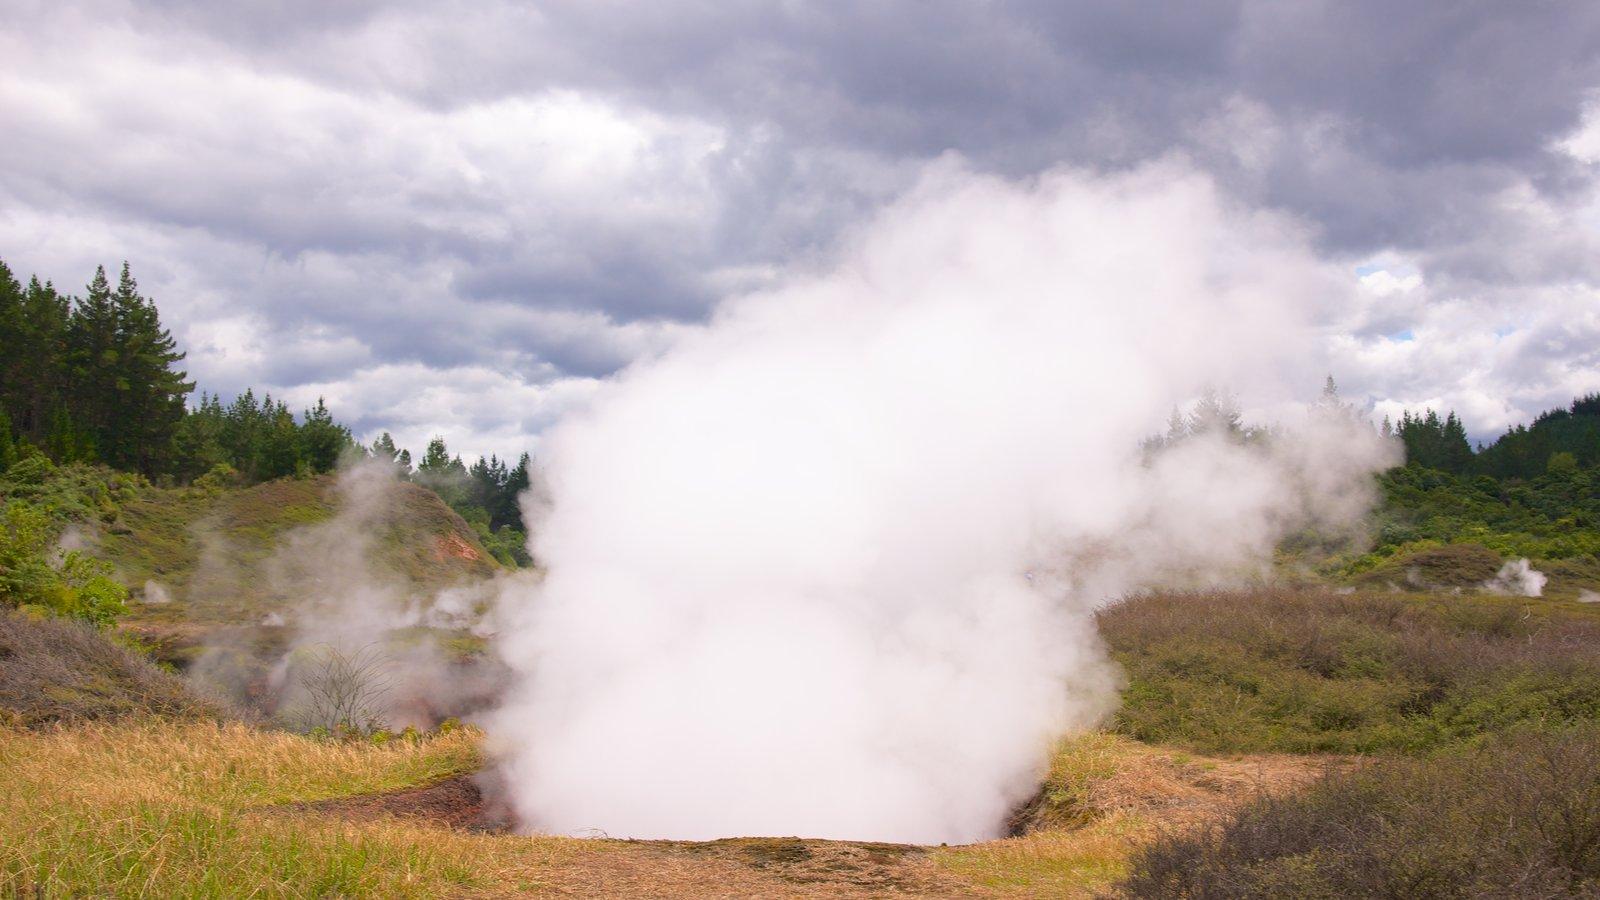 Craters of the Moon que inclui neblina e cenas tranquilas